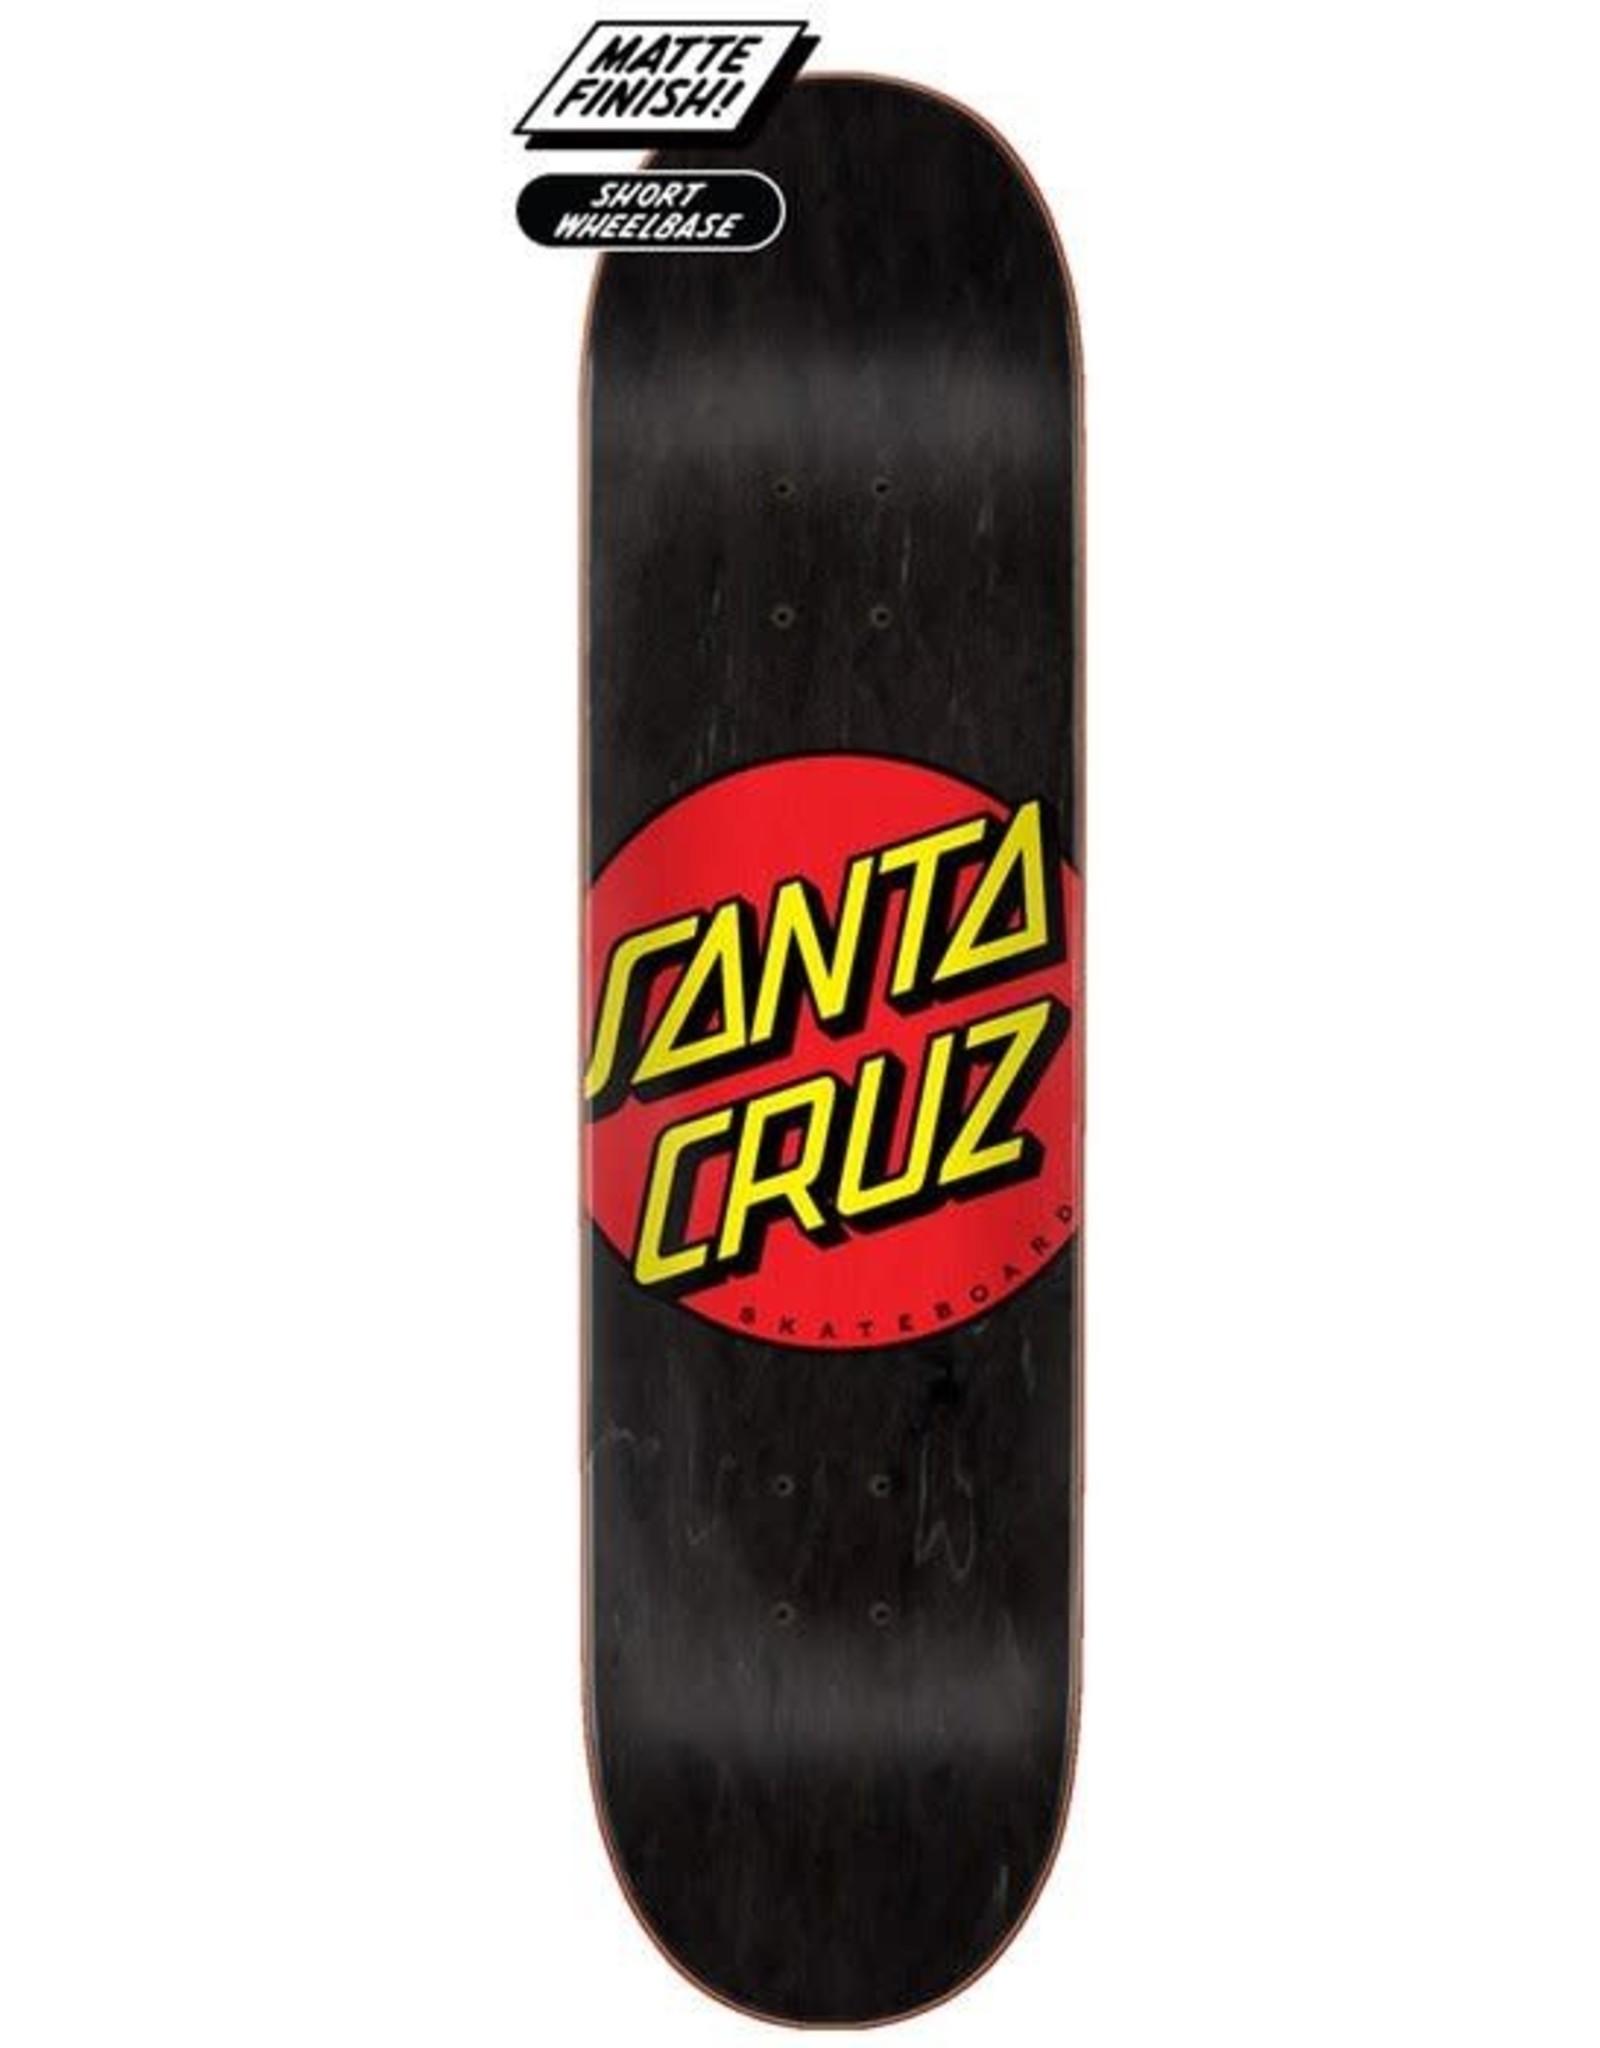 "Santa Cruz Santa Cruz - CLASSIC DOT DECK - 8.25"""